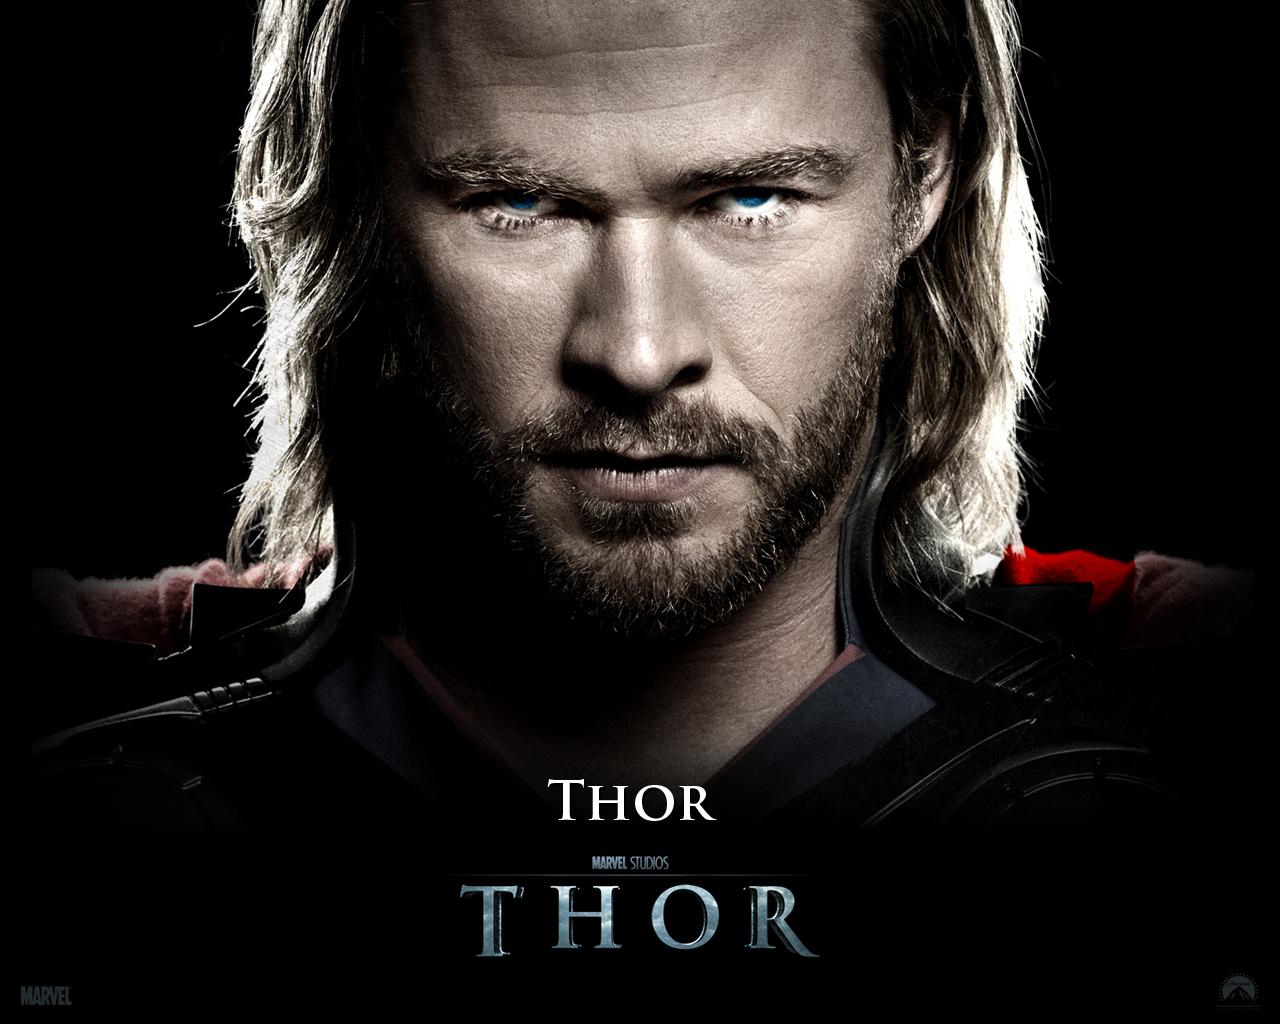 http://2.bp.blogspot.com/-MrnNZ6Iwol8/TfUcJuA4_6I/AAAAAAAAADA/pFVMPrLA2KI/s1600/Thor-Movie-wallpaper-1.jpg